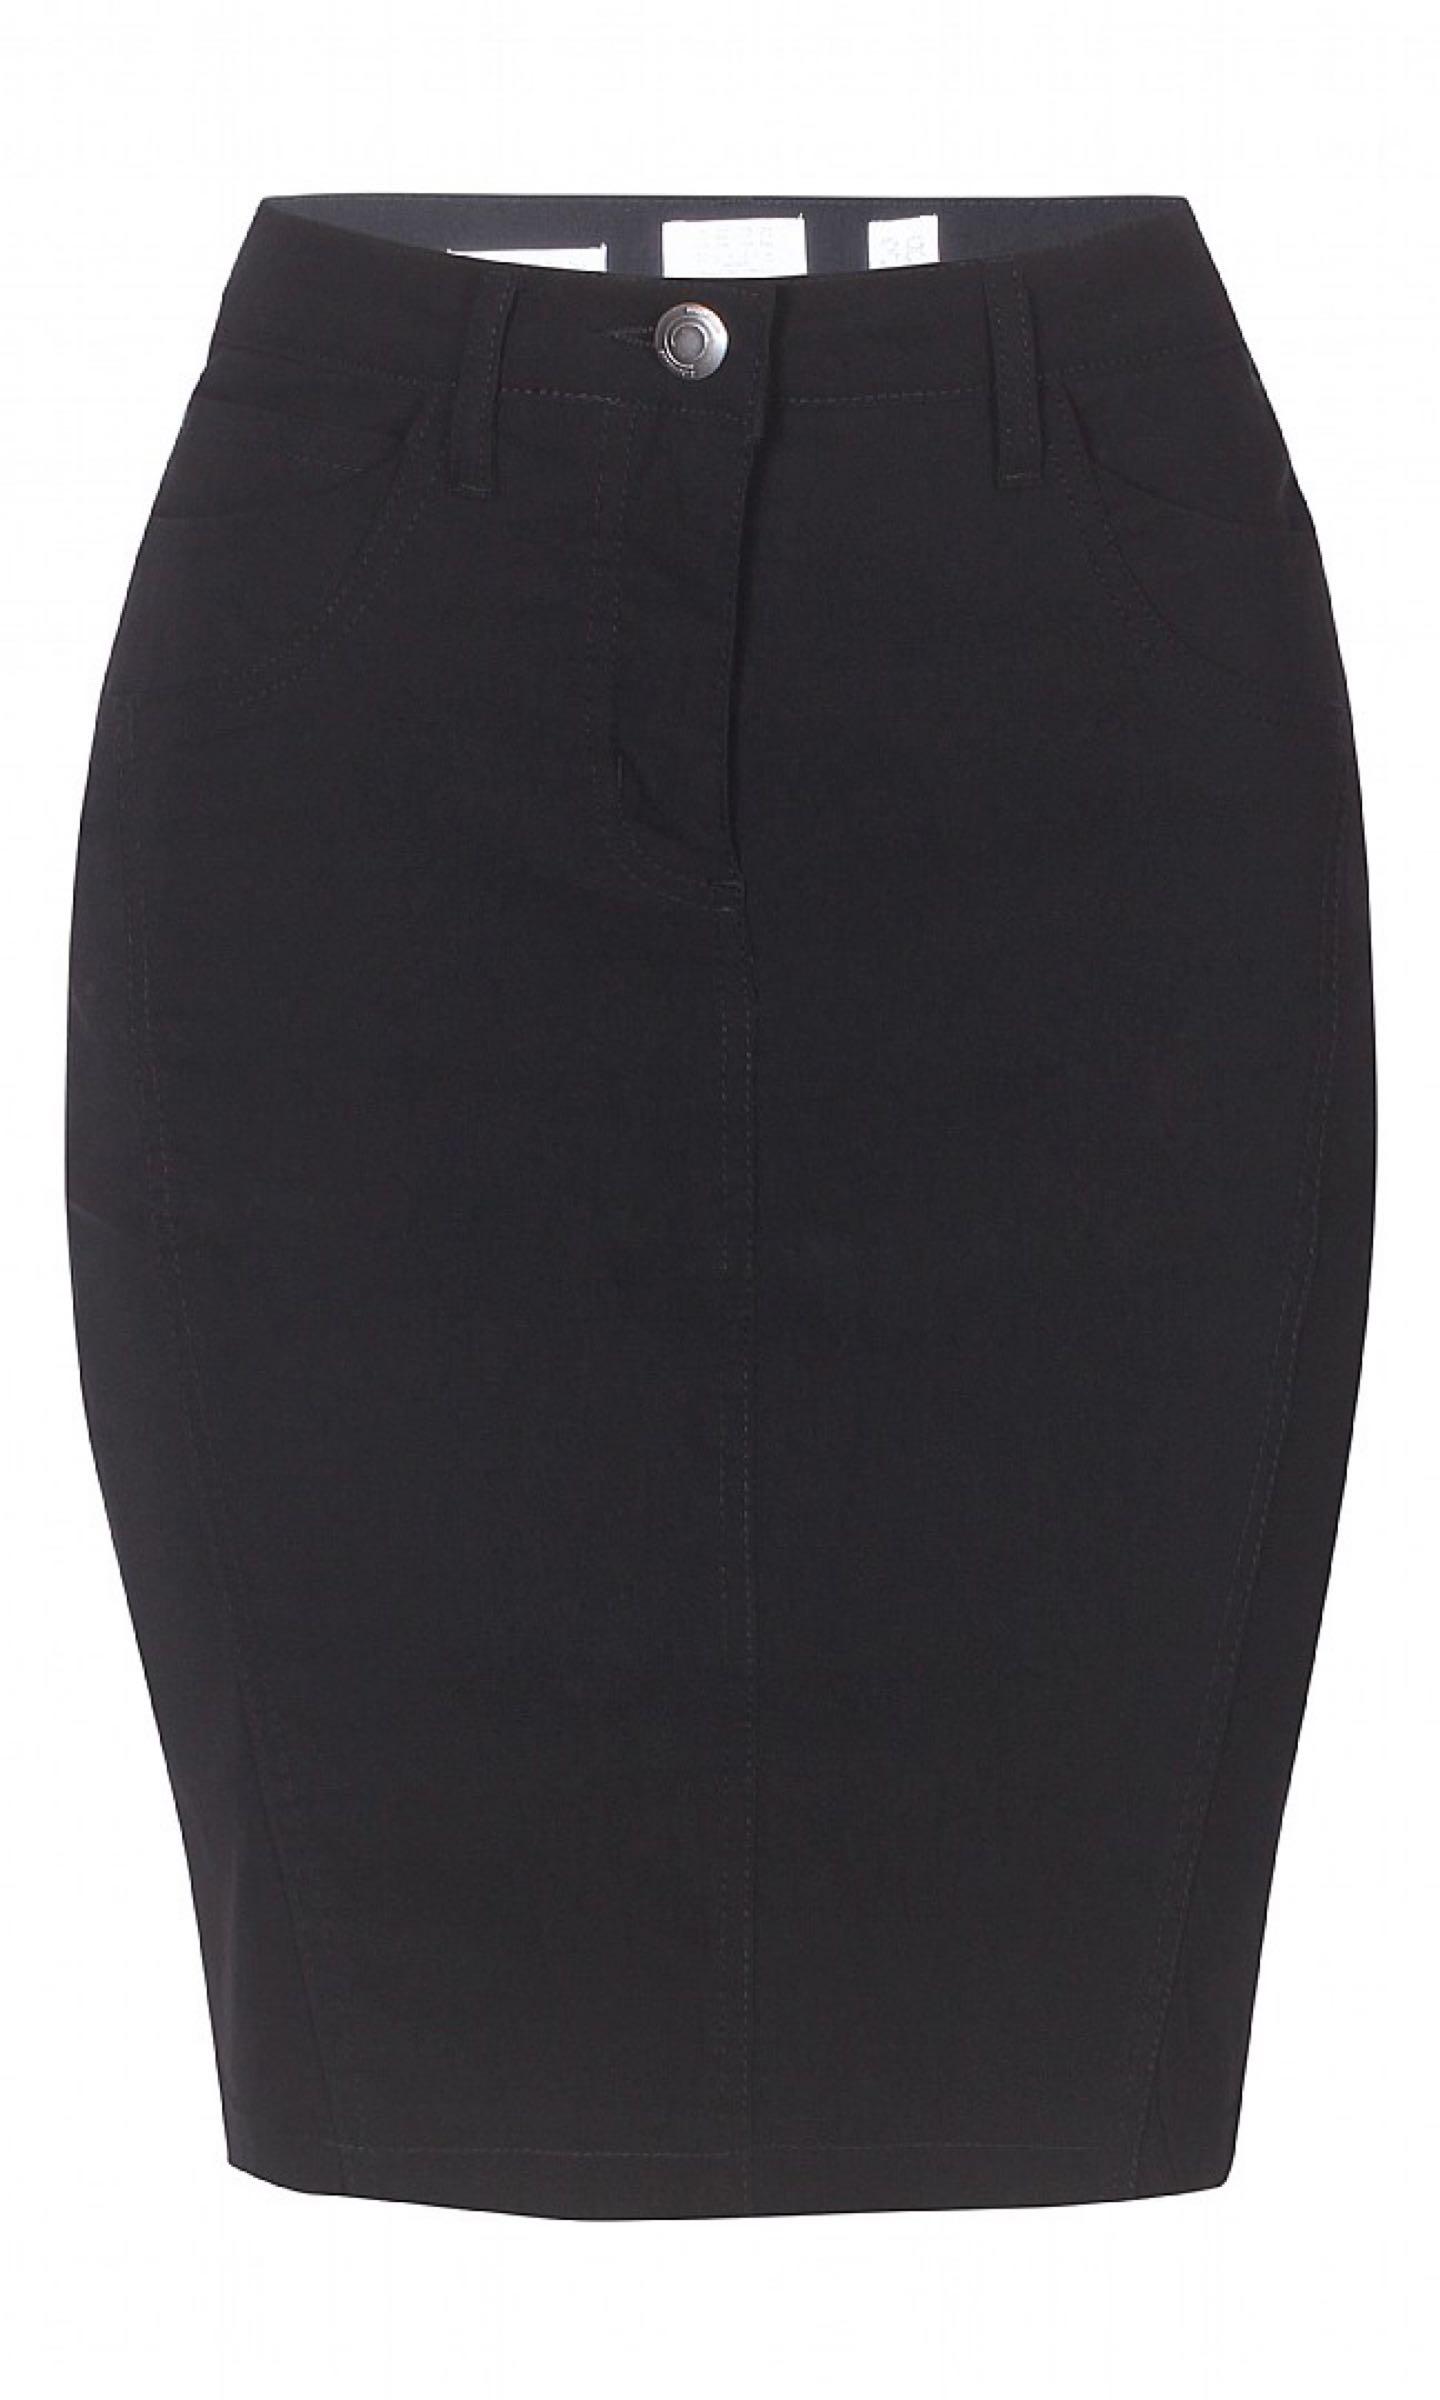 Lance svart kjol